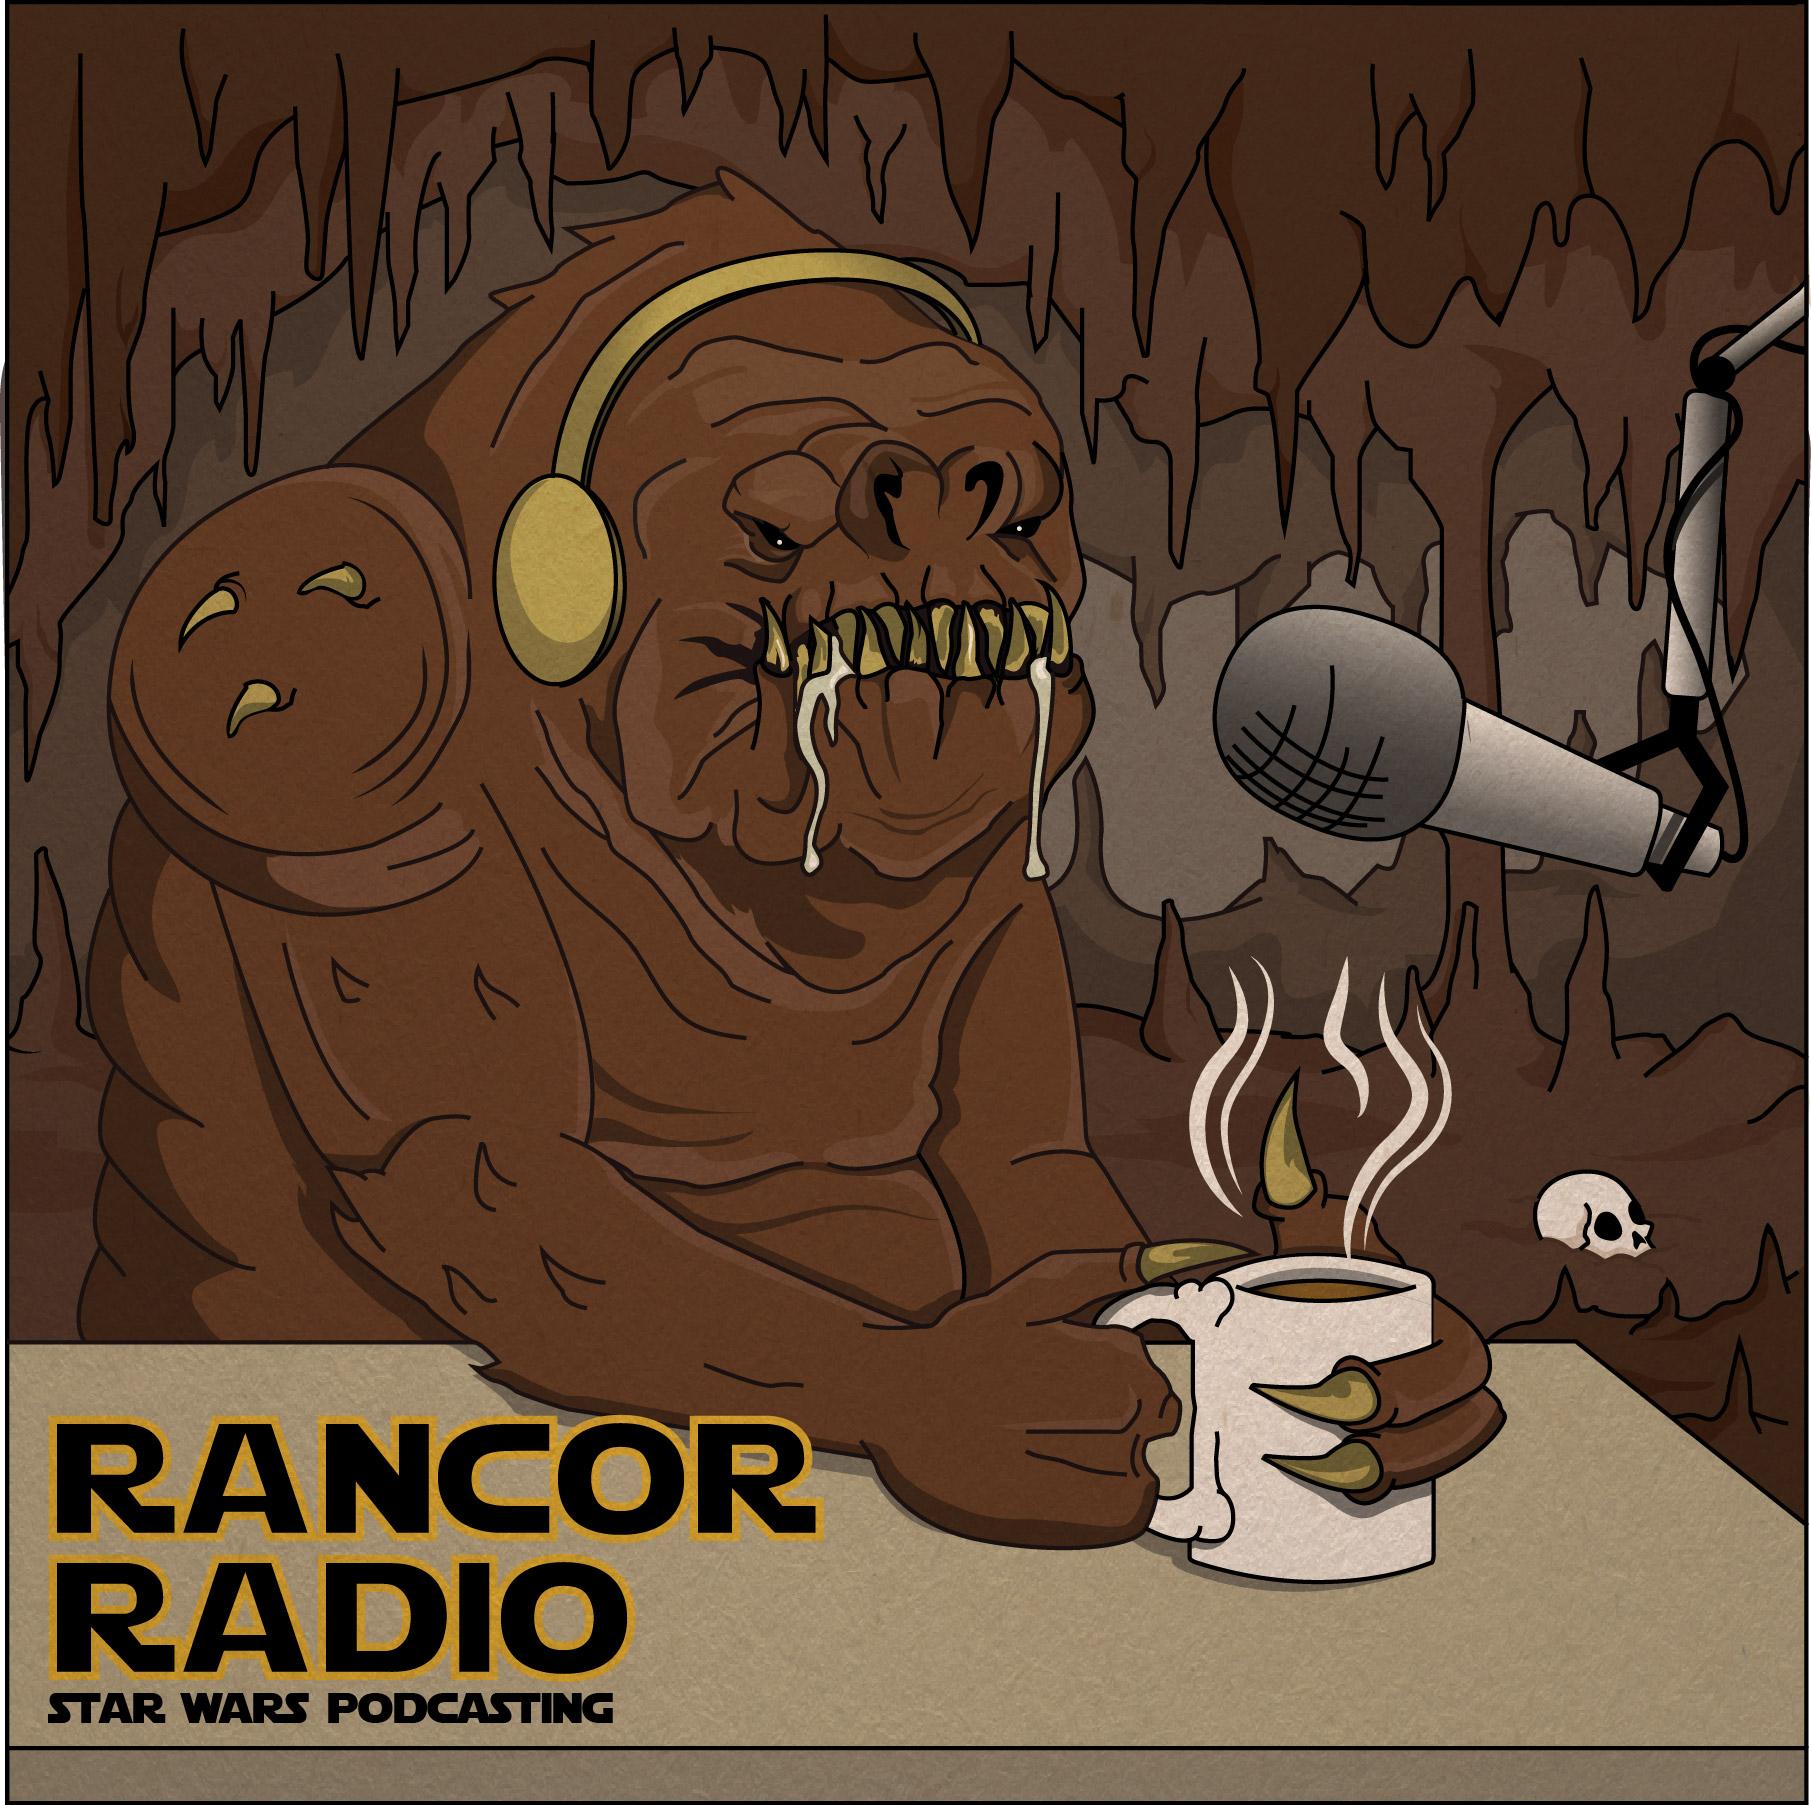 """RANCOR RADIO: STAR WARS PODCASTING"""